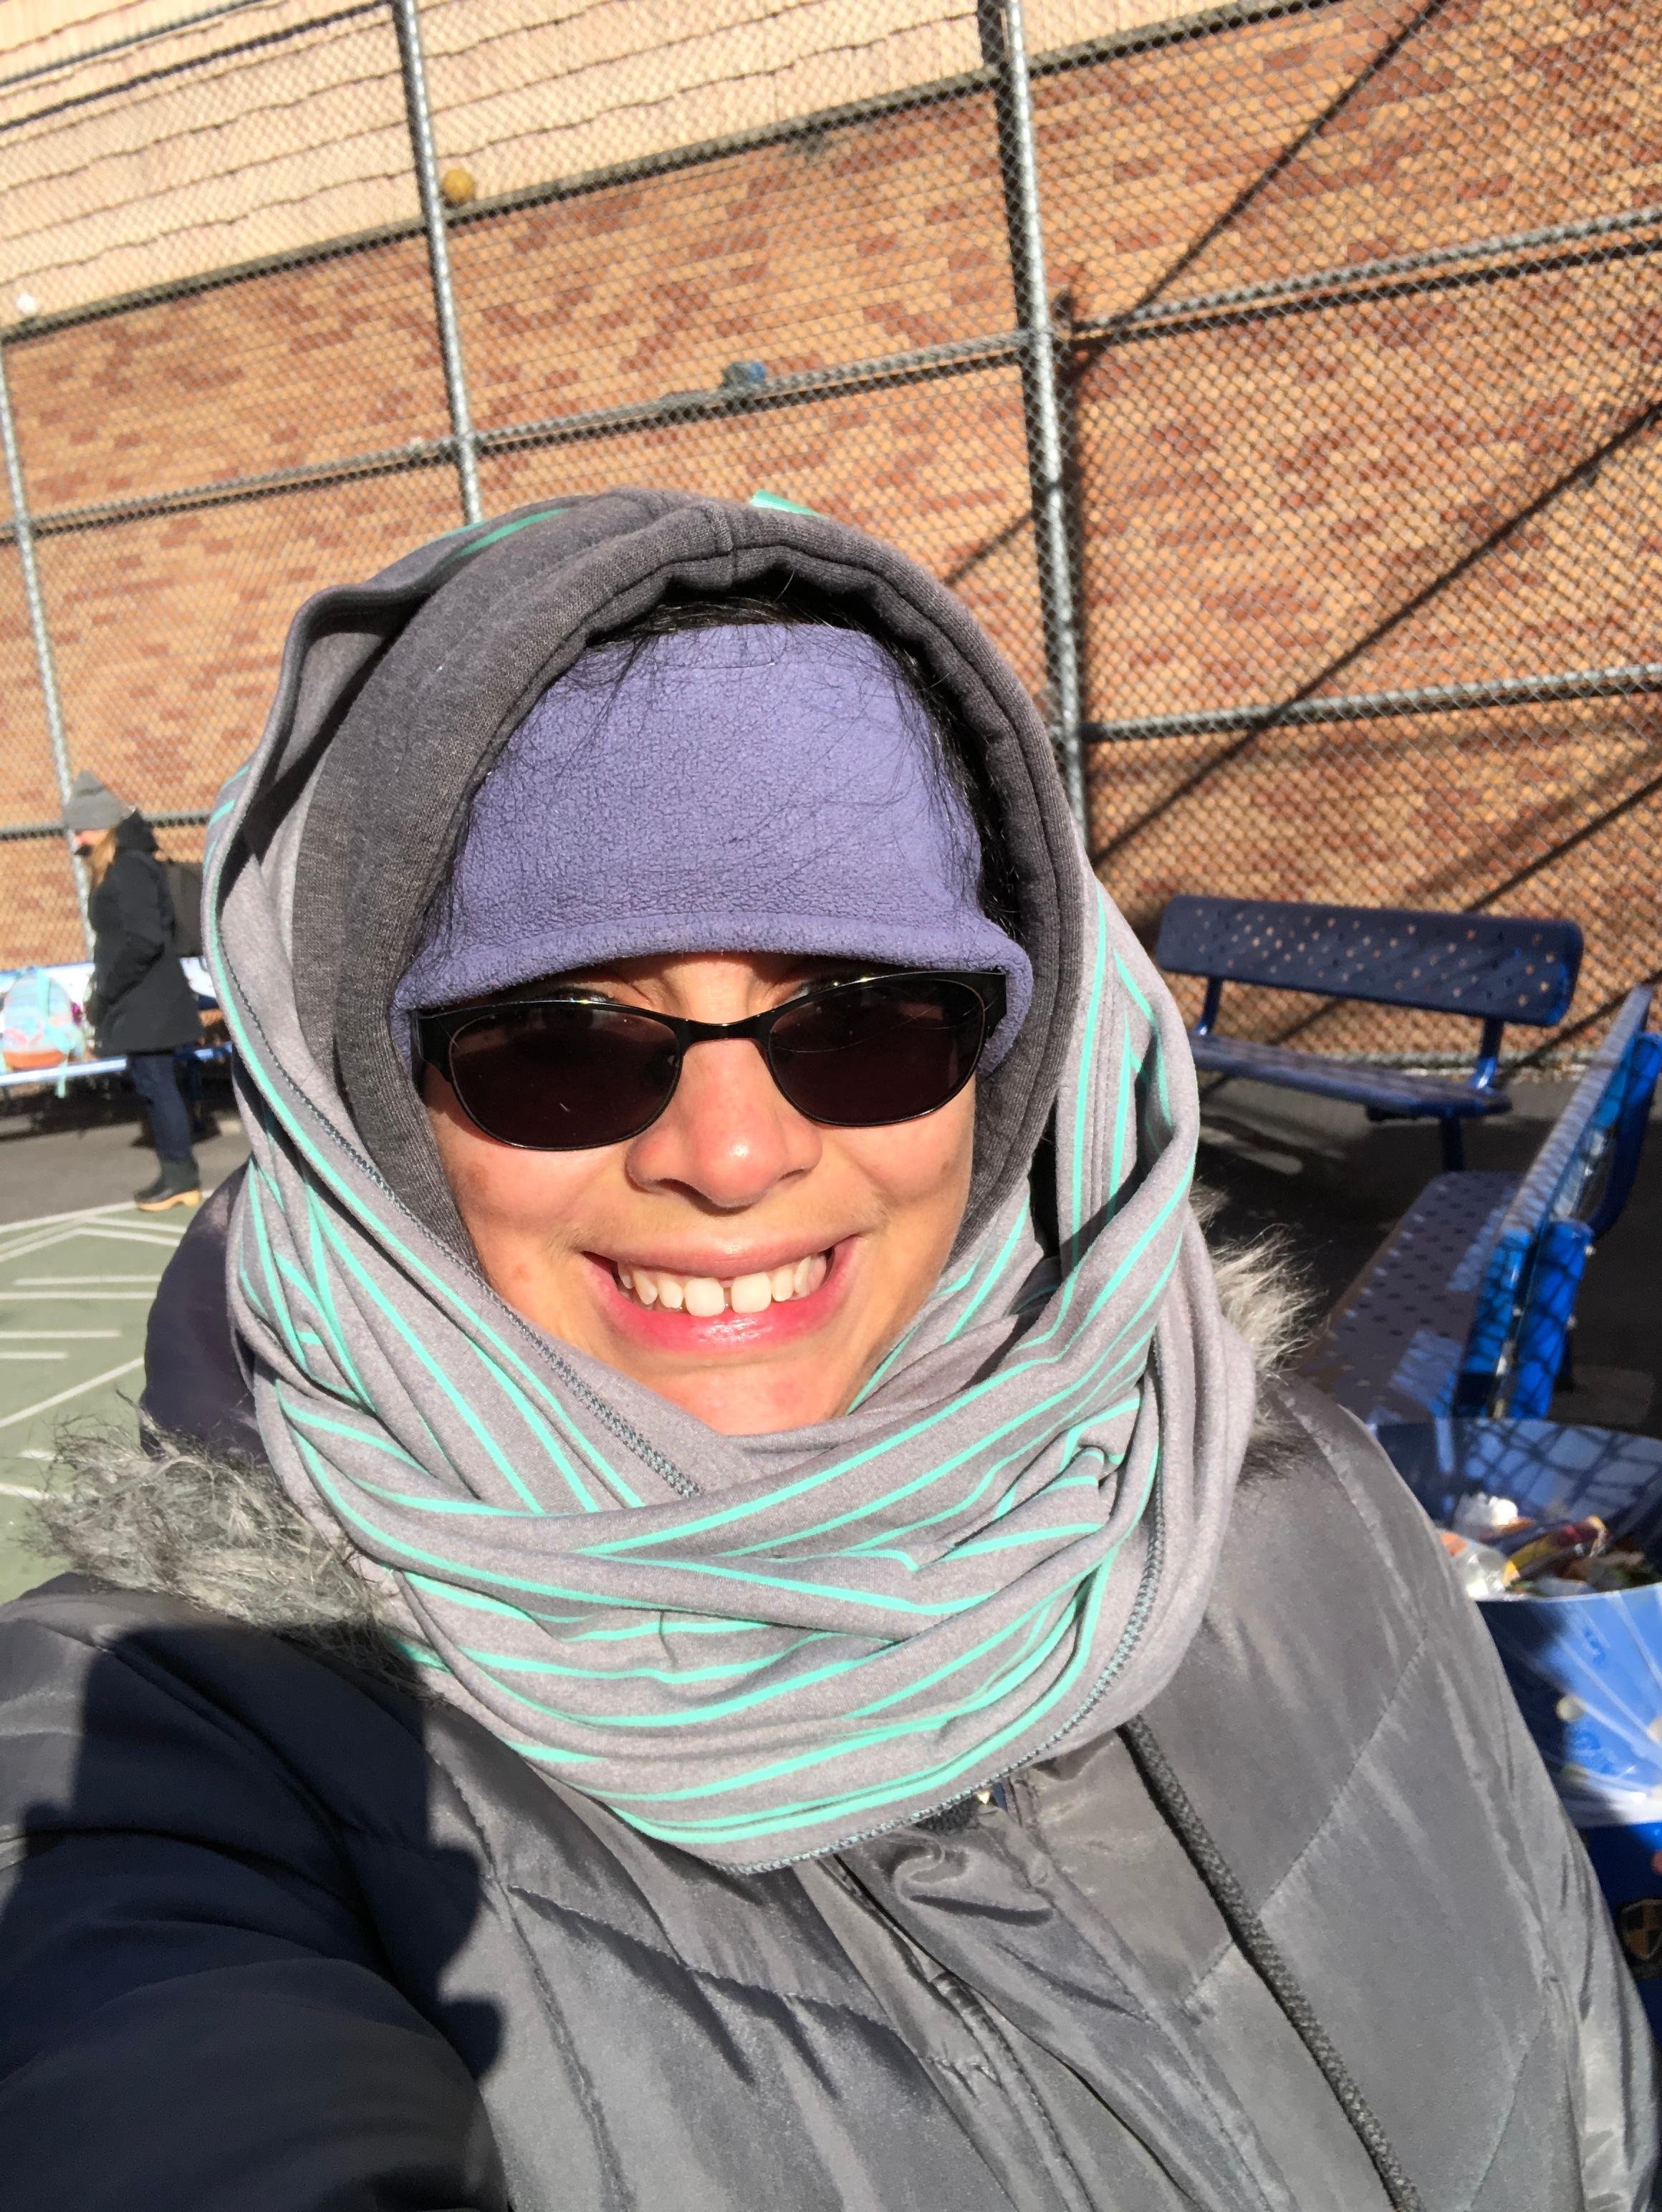 Li Yun Alvarado wearing winter gear: big coat, hoodie, and scarf.